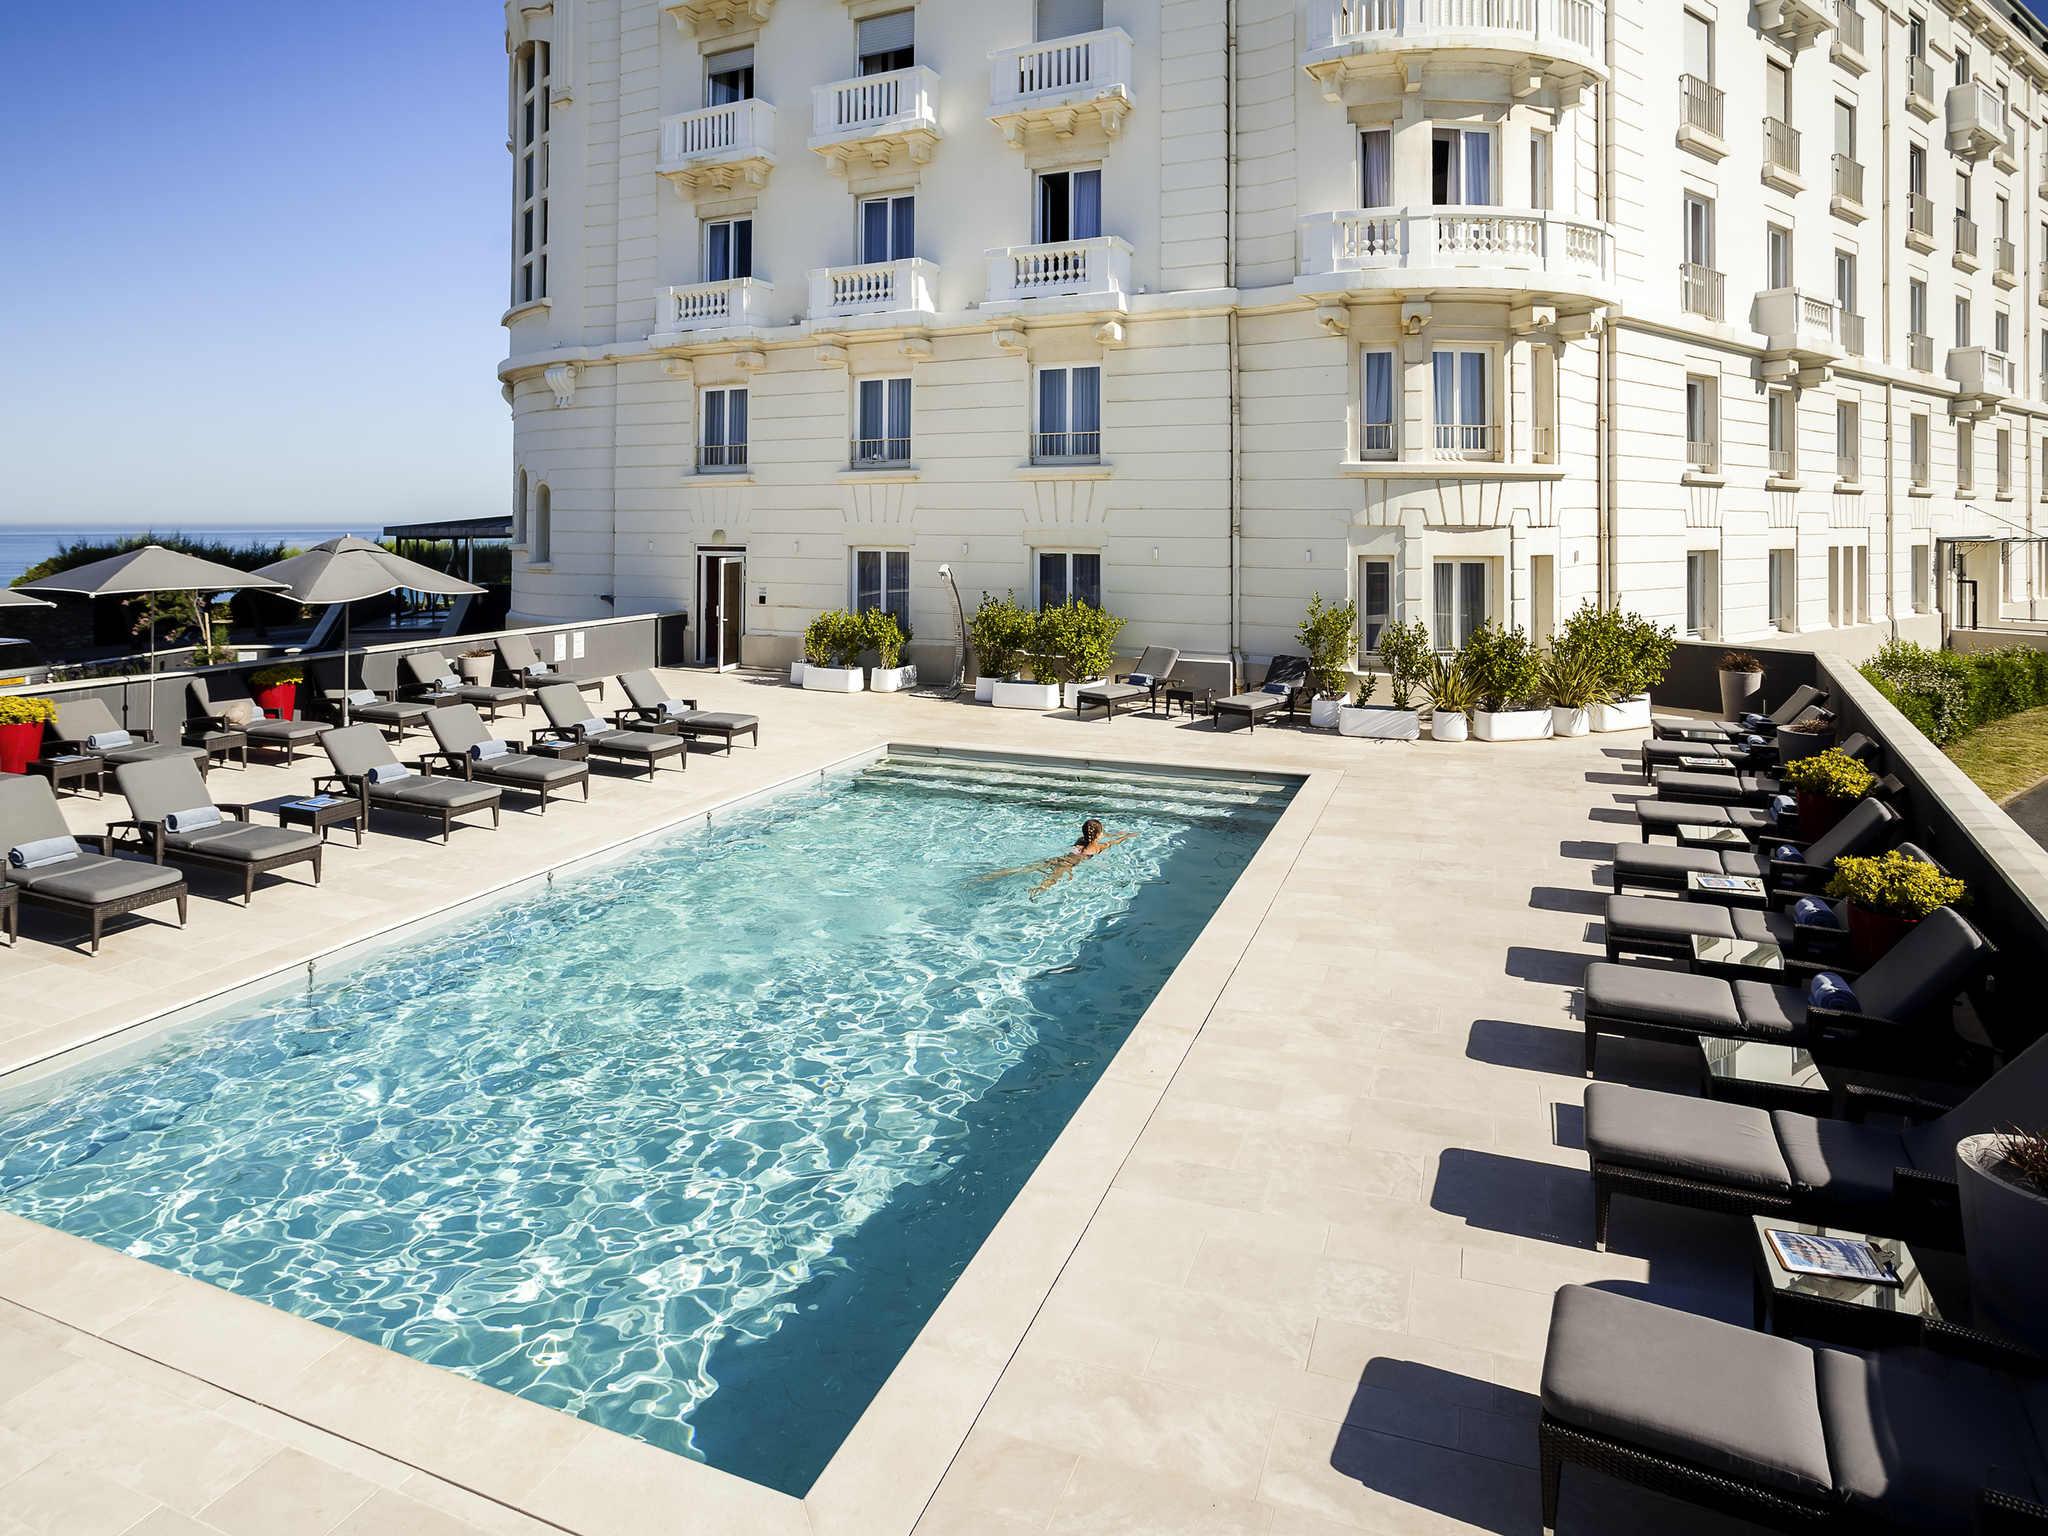 Hotel – Le Régina Biarritz Hôtel & Spa - MGallery by Sofitel